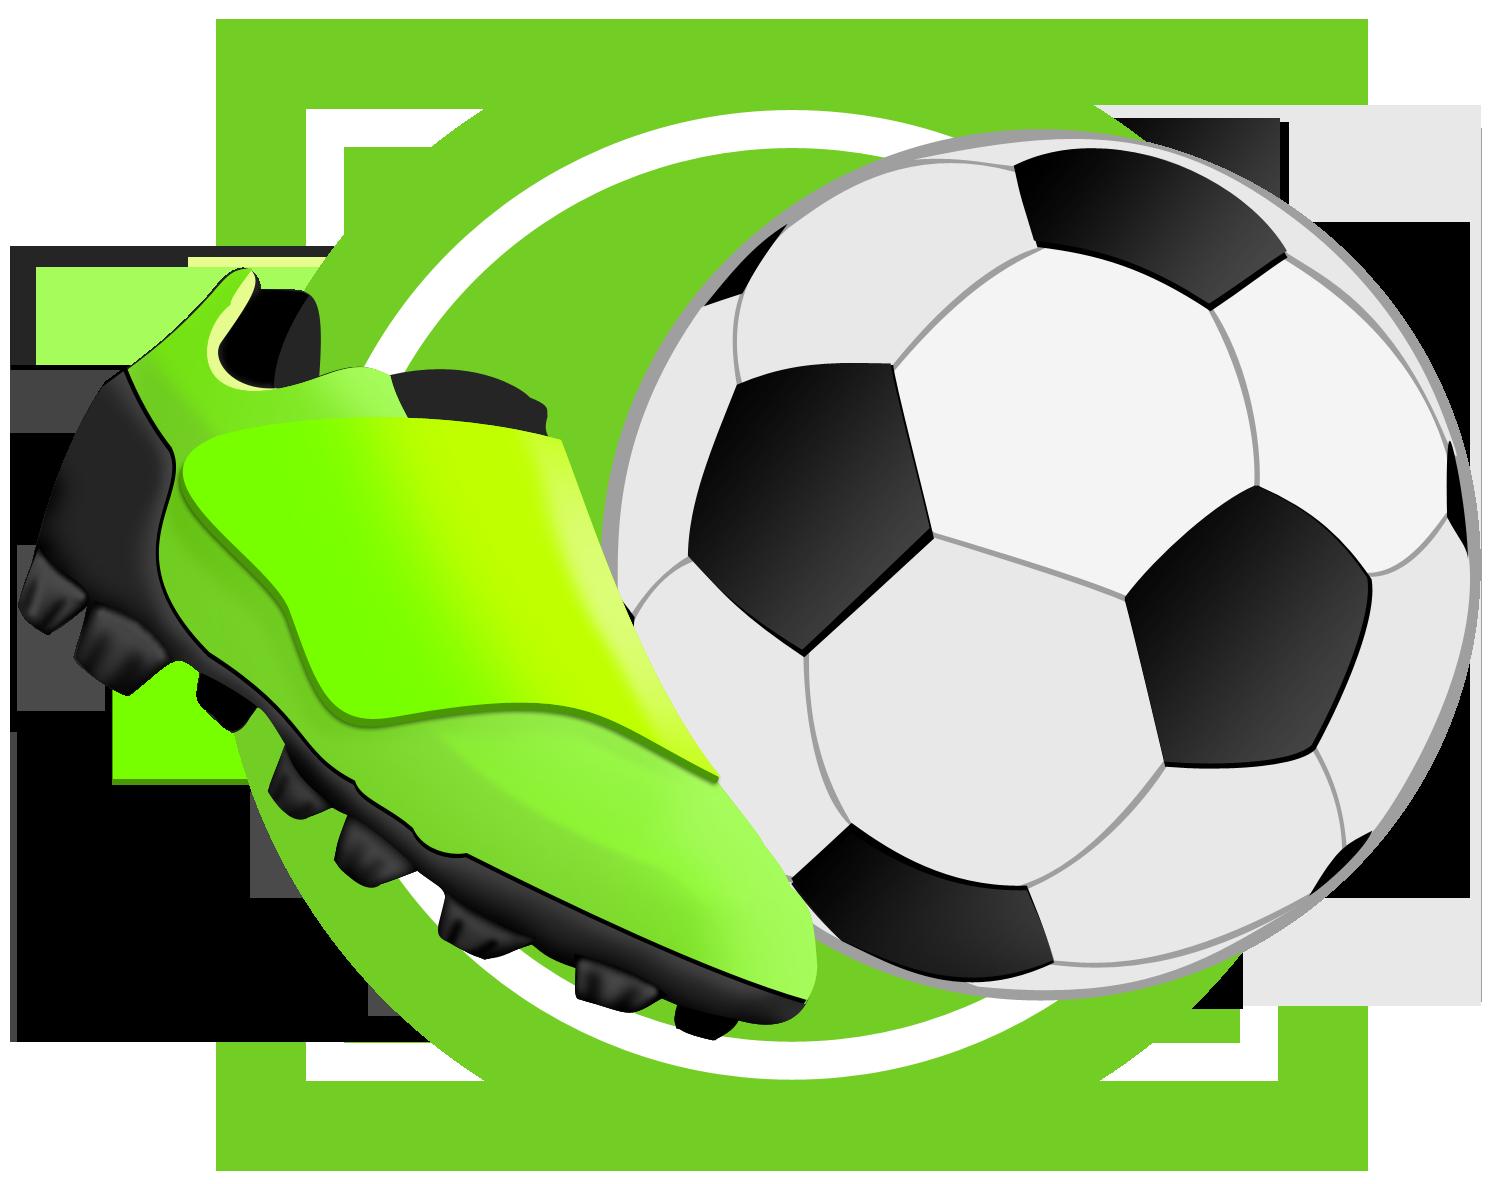 football logo wallpaper 1490x1184